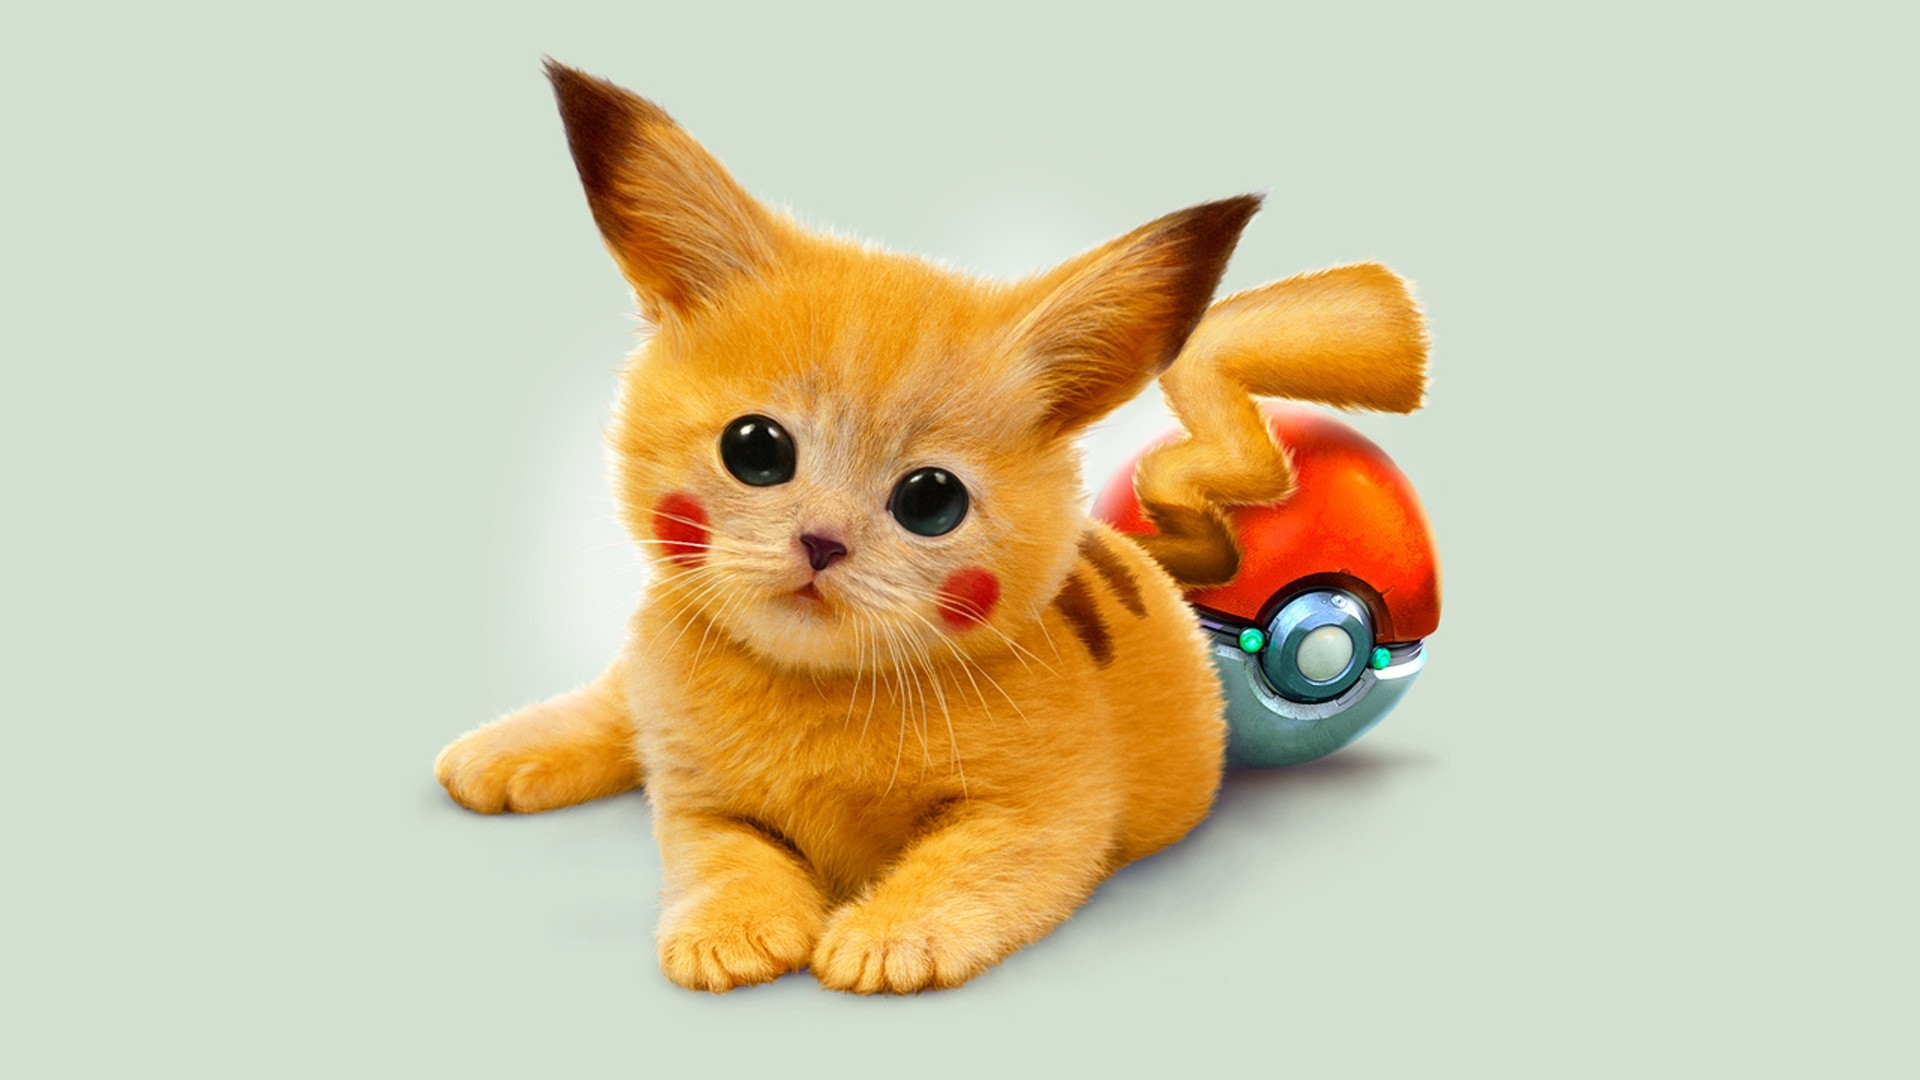 … aggression; art, kitty, pokemon